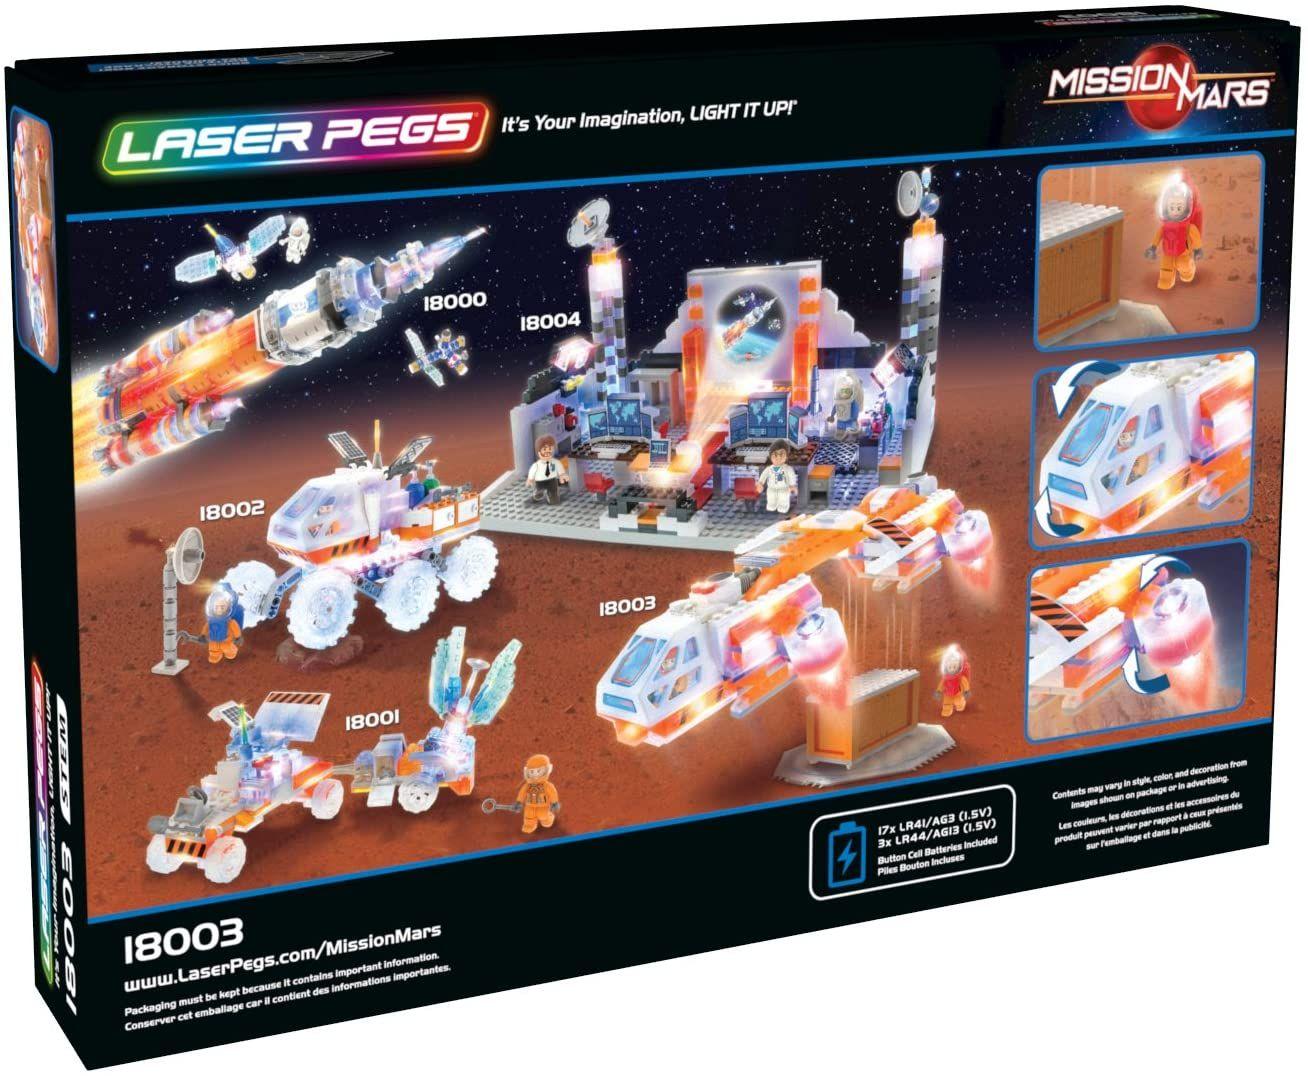 Светещ конструктор Laser Pegs Mission Mars - Совалка - 3